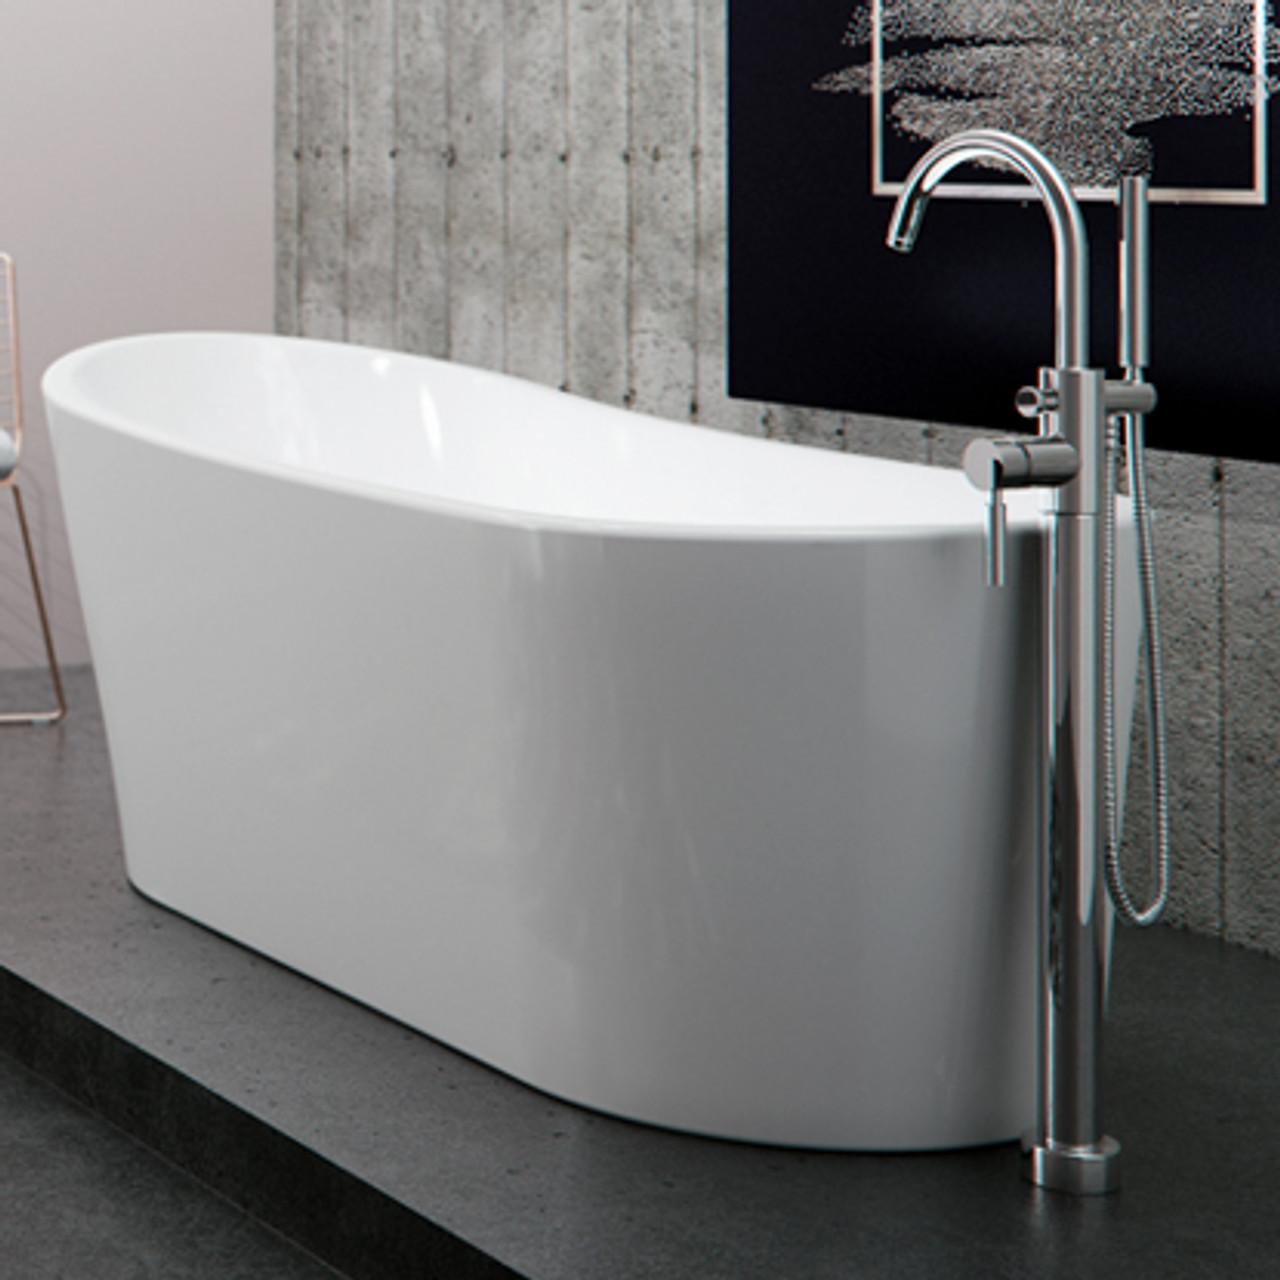 Neptune Paris Freestanding Bathtub 67 Quot X 31 Quot York Taps